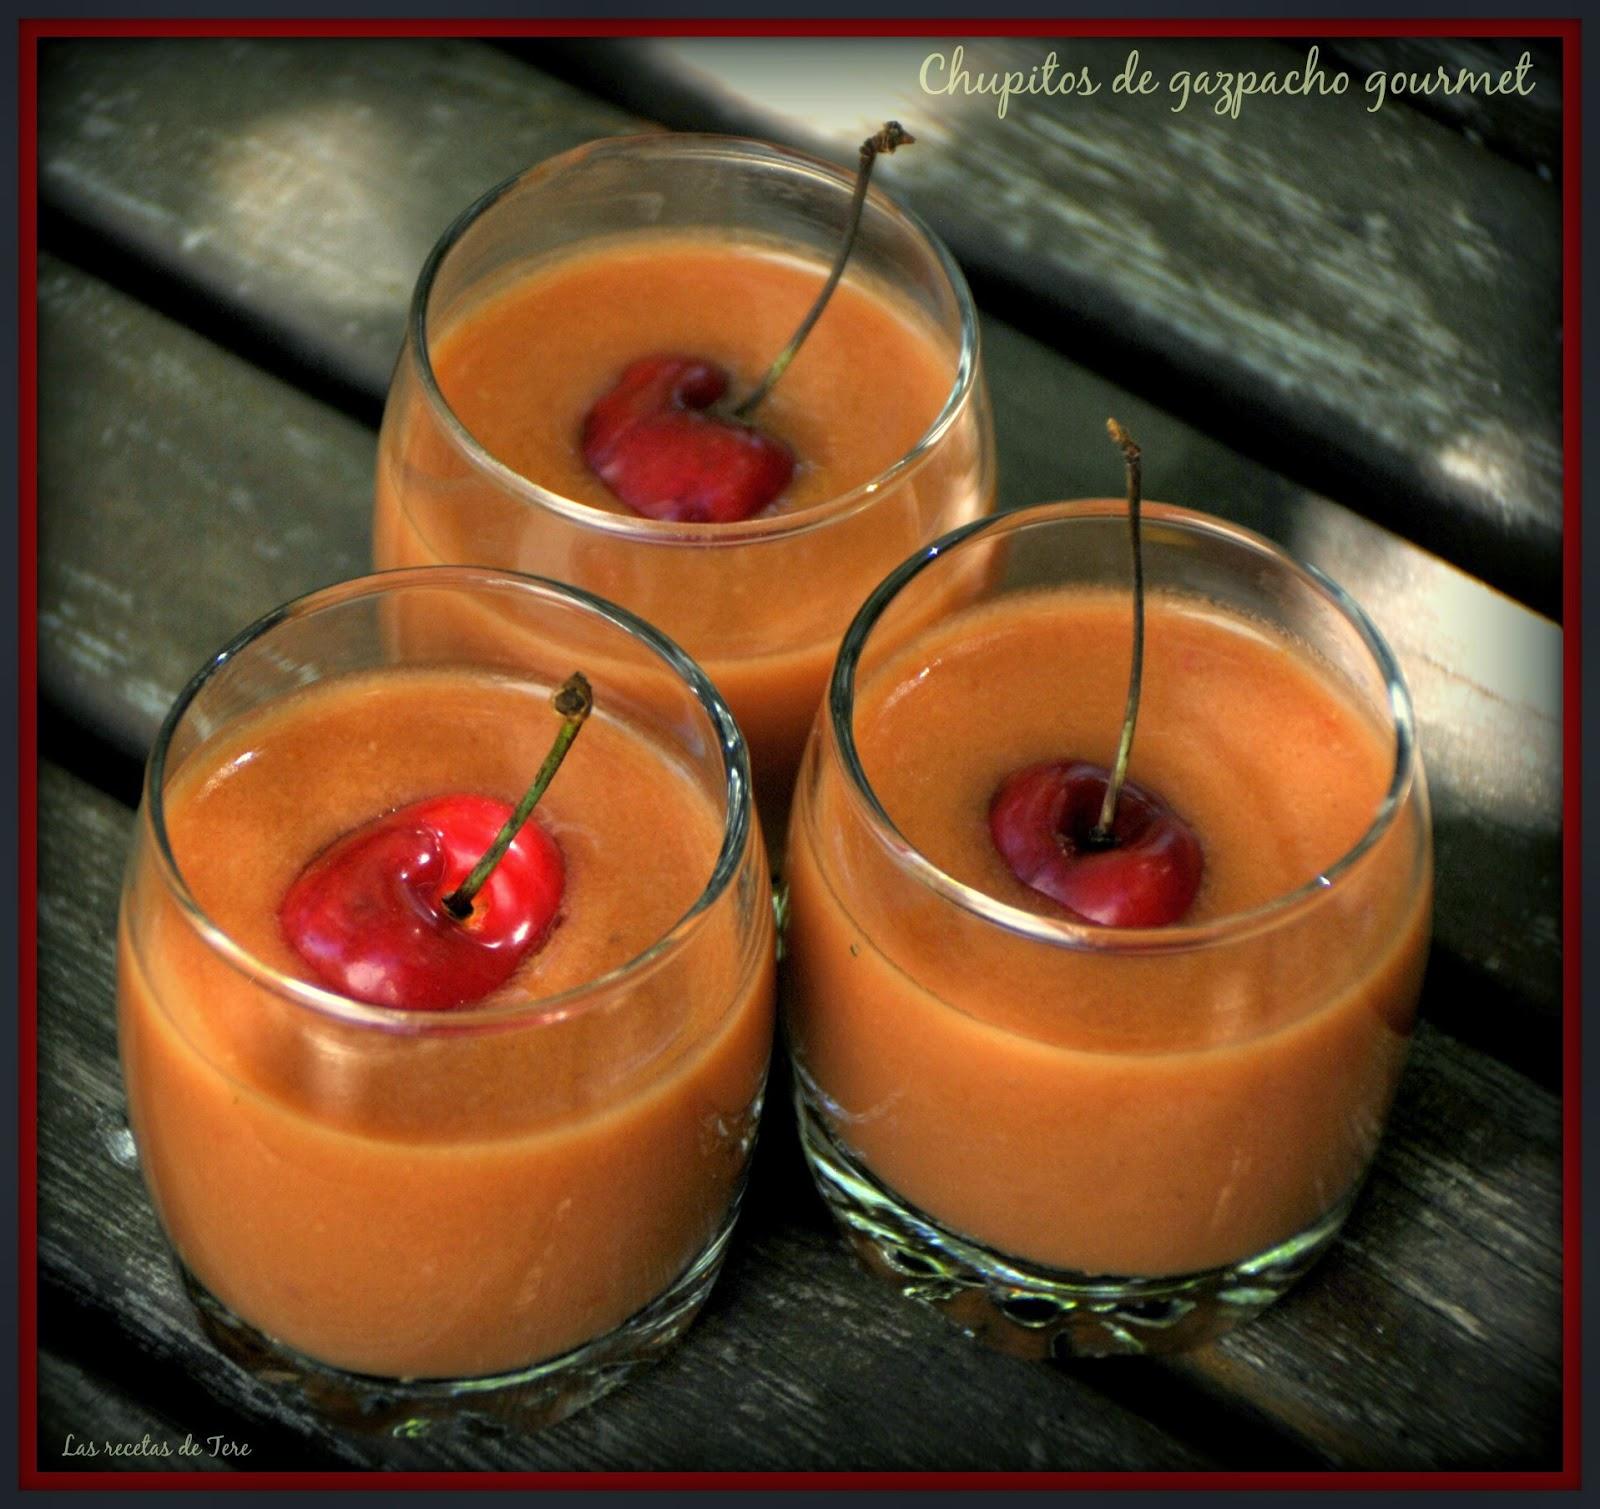 Chupitos de gazpacho gourmet 01